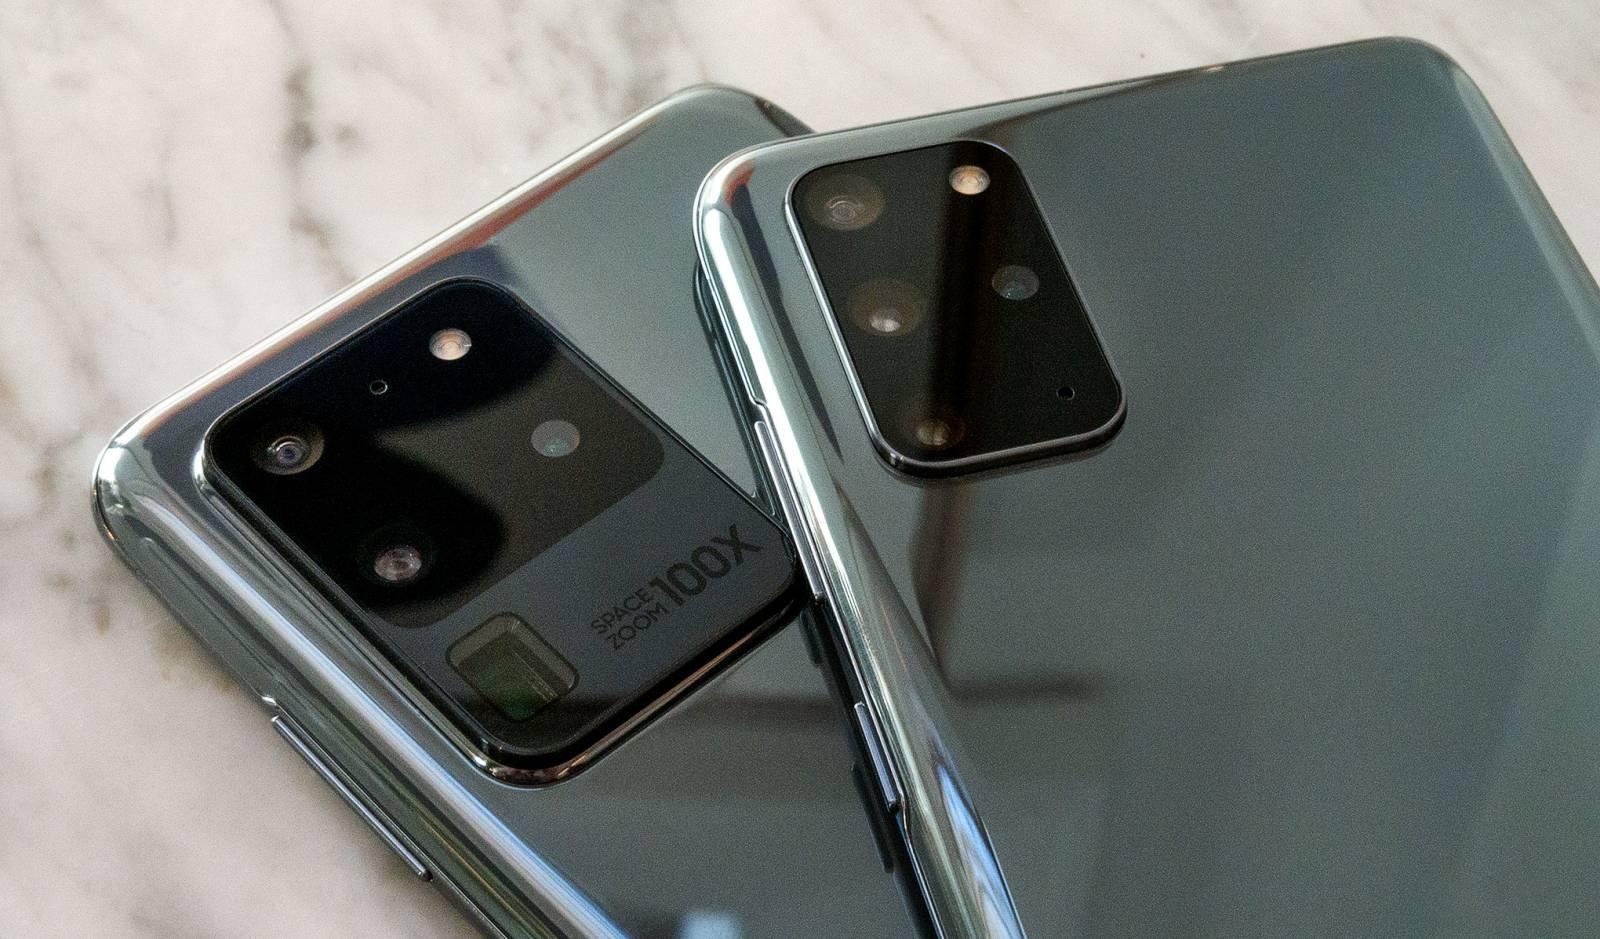 Samsung GALAXY S20 Ultra update